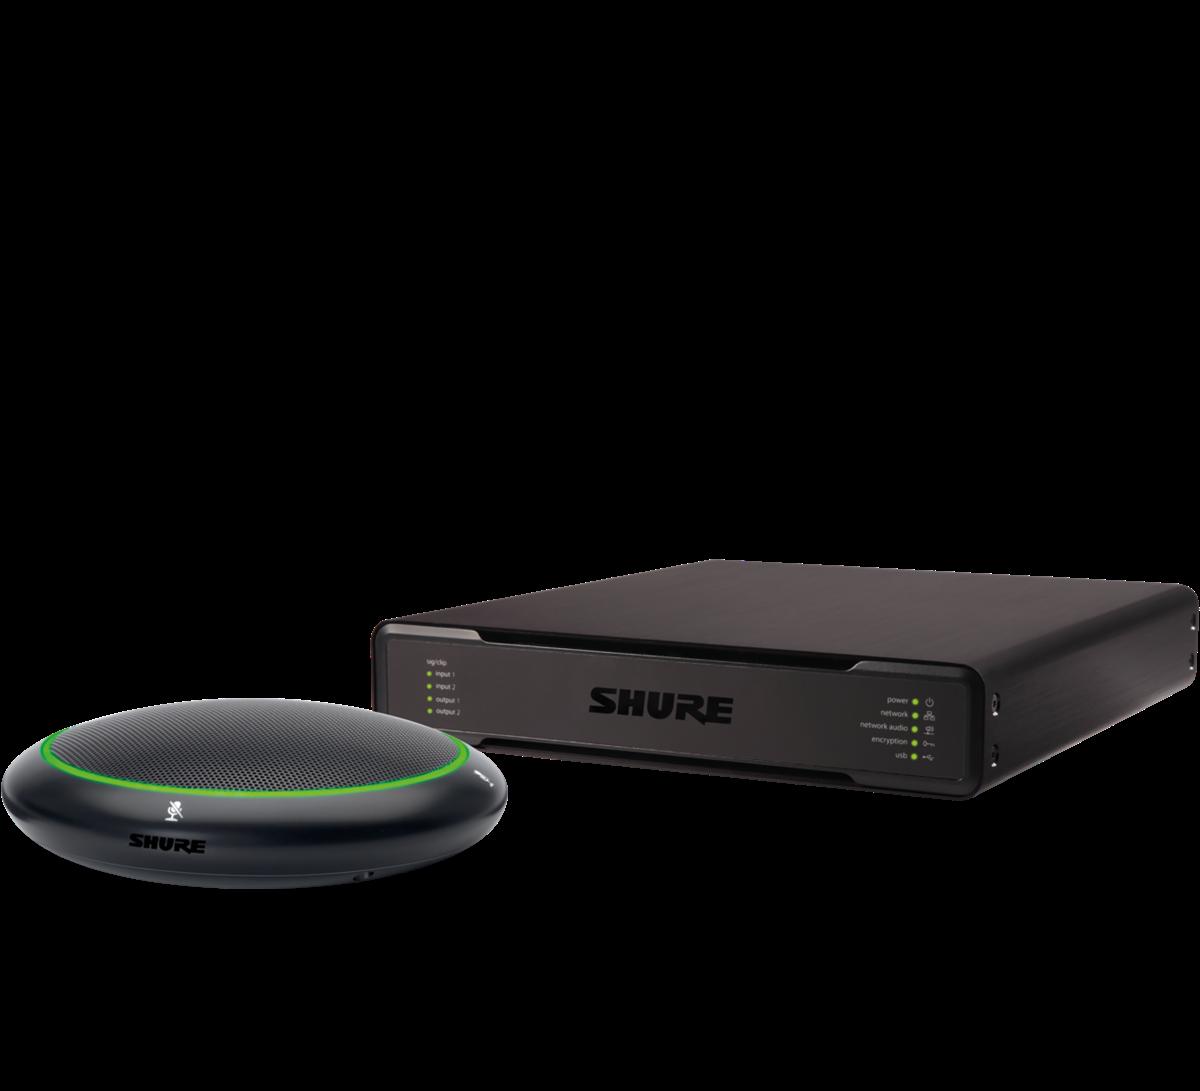 Shure MXA310 and P300 Table Array Intellimix White